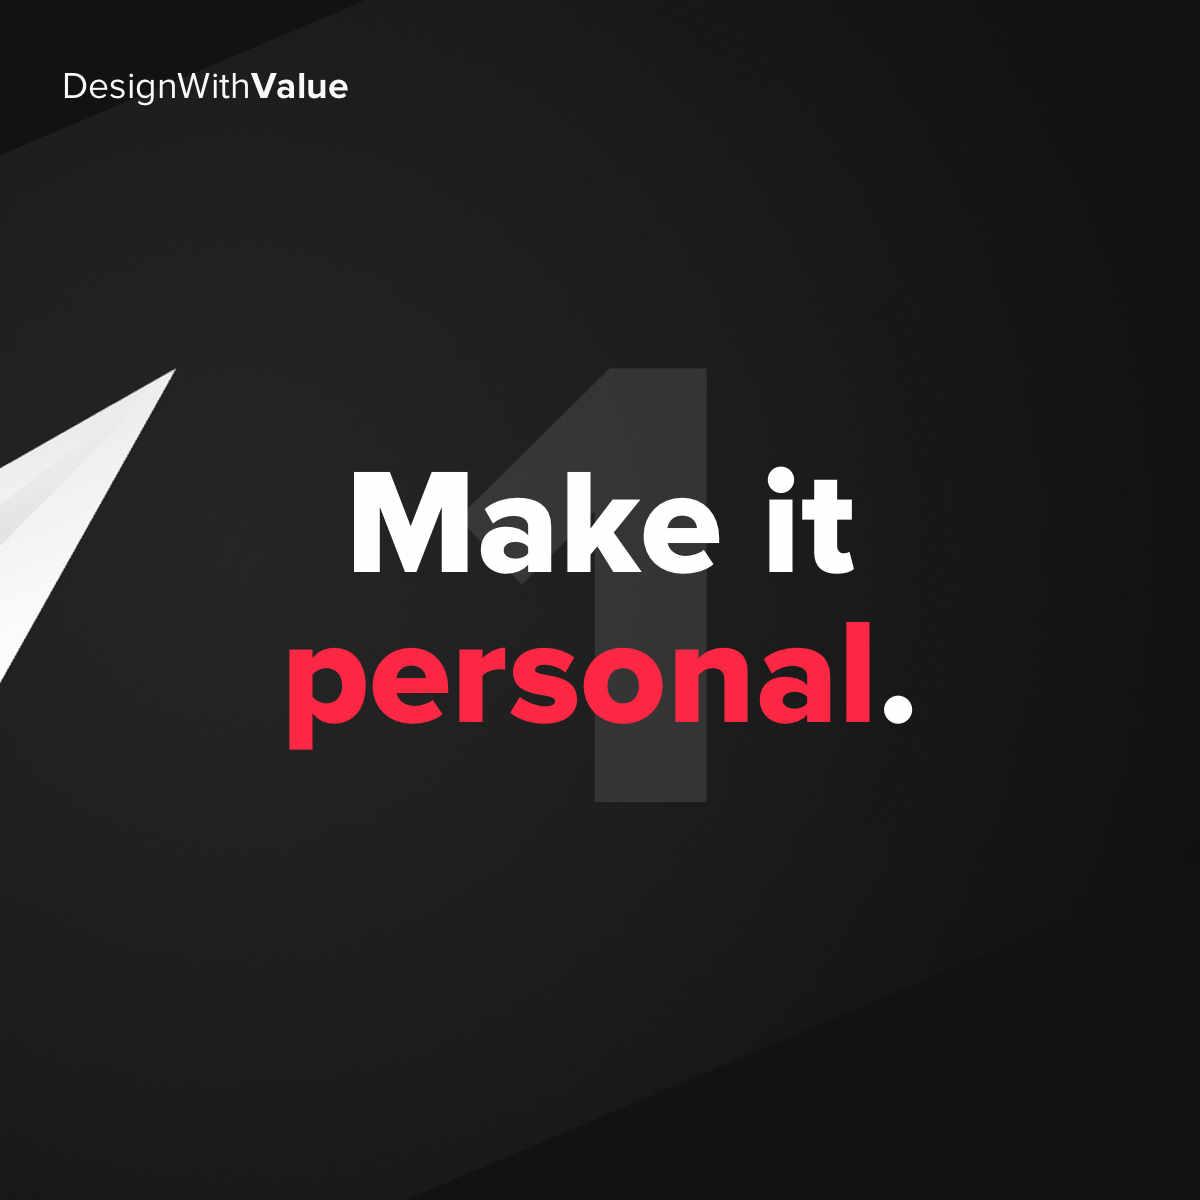 1. Make it personal